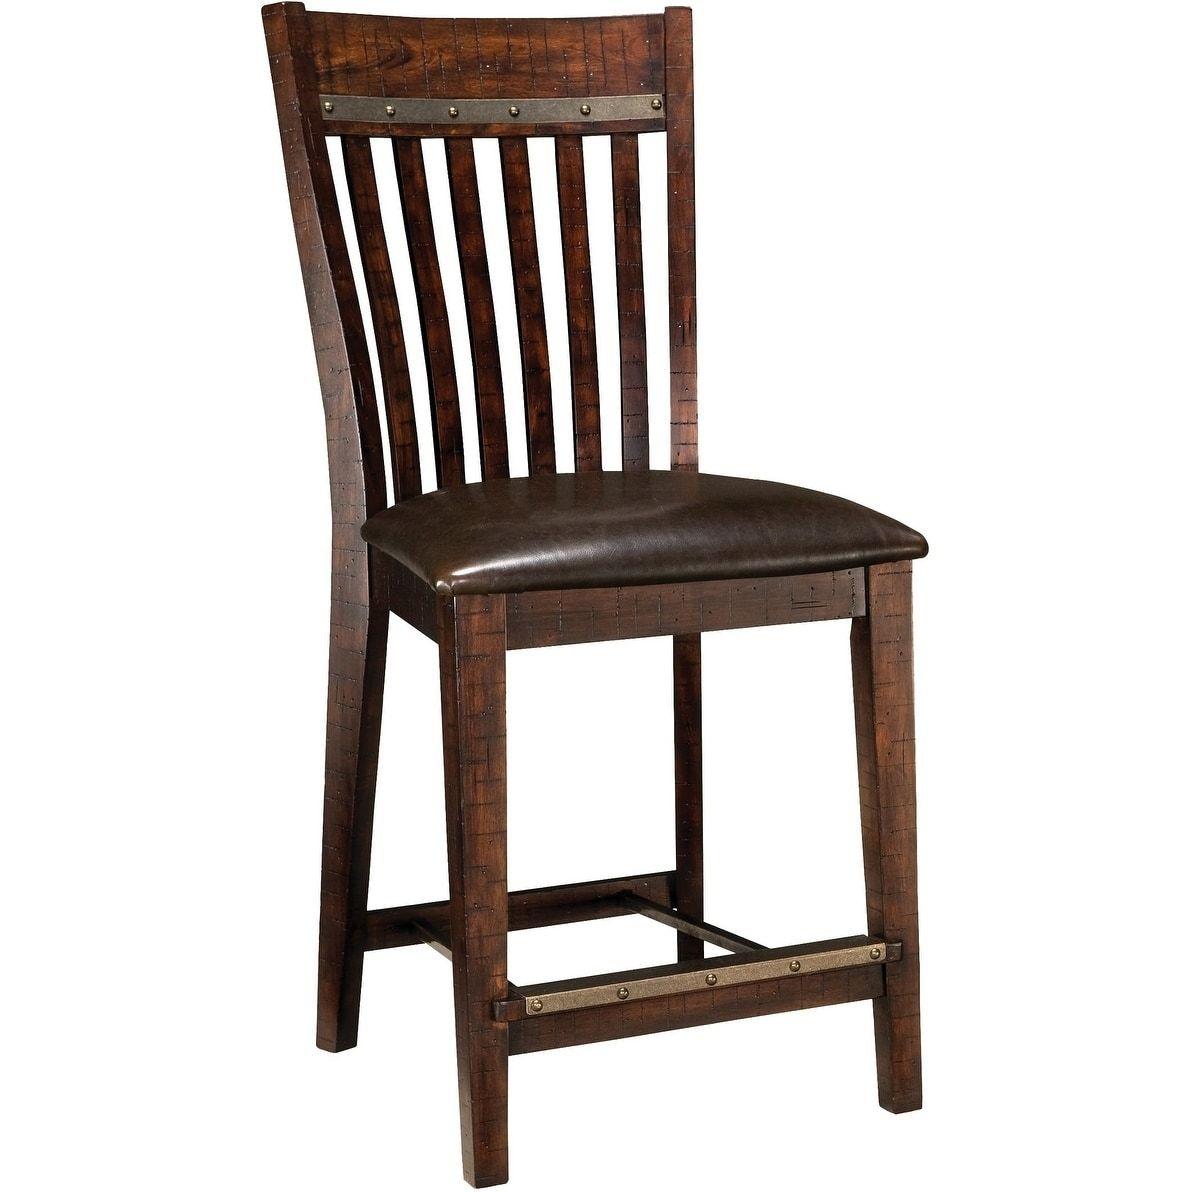 Super Hayden Rough Sawn Espresso Slatback Counter Height Barstool Machost Co Dining Chair Design Ideas Machostcouk